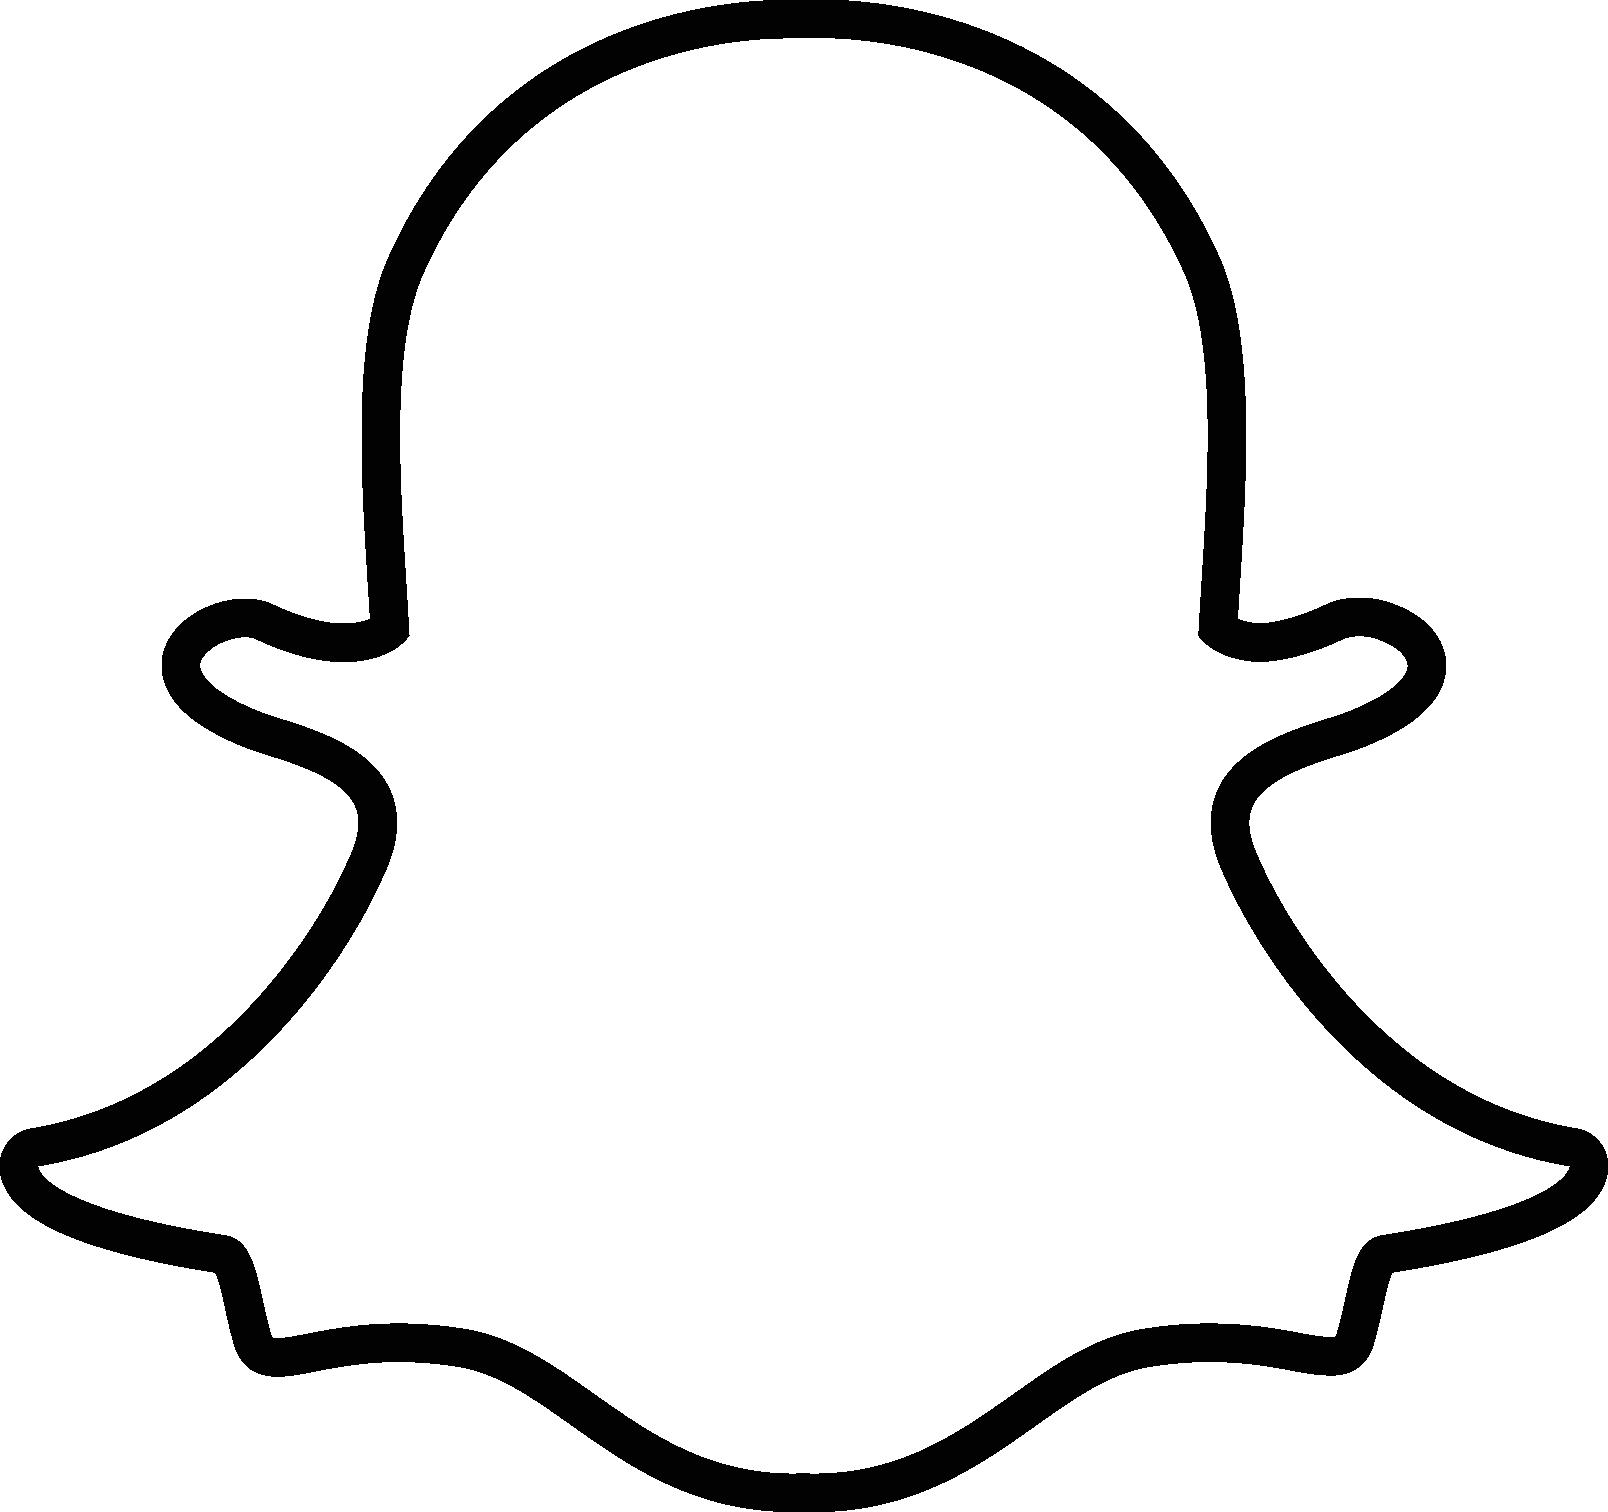 Snapchat Logo Snapchat Com Vector Eps Free Download Logo Icons Clipart Snapchat Logo Iphone Icon Snapchat Icon